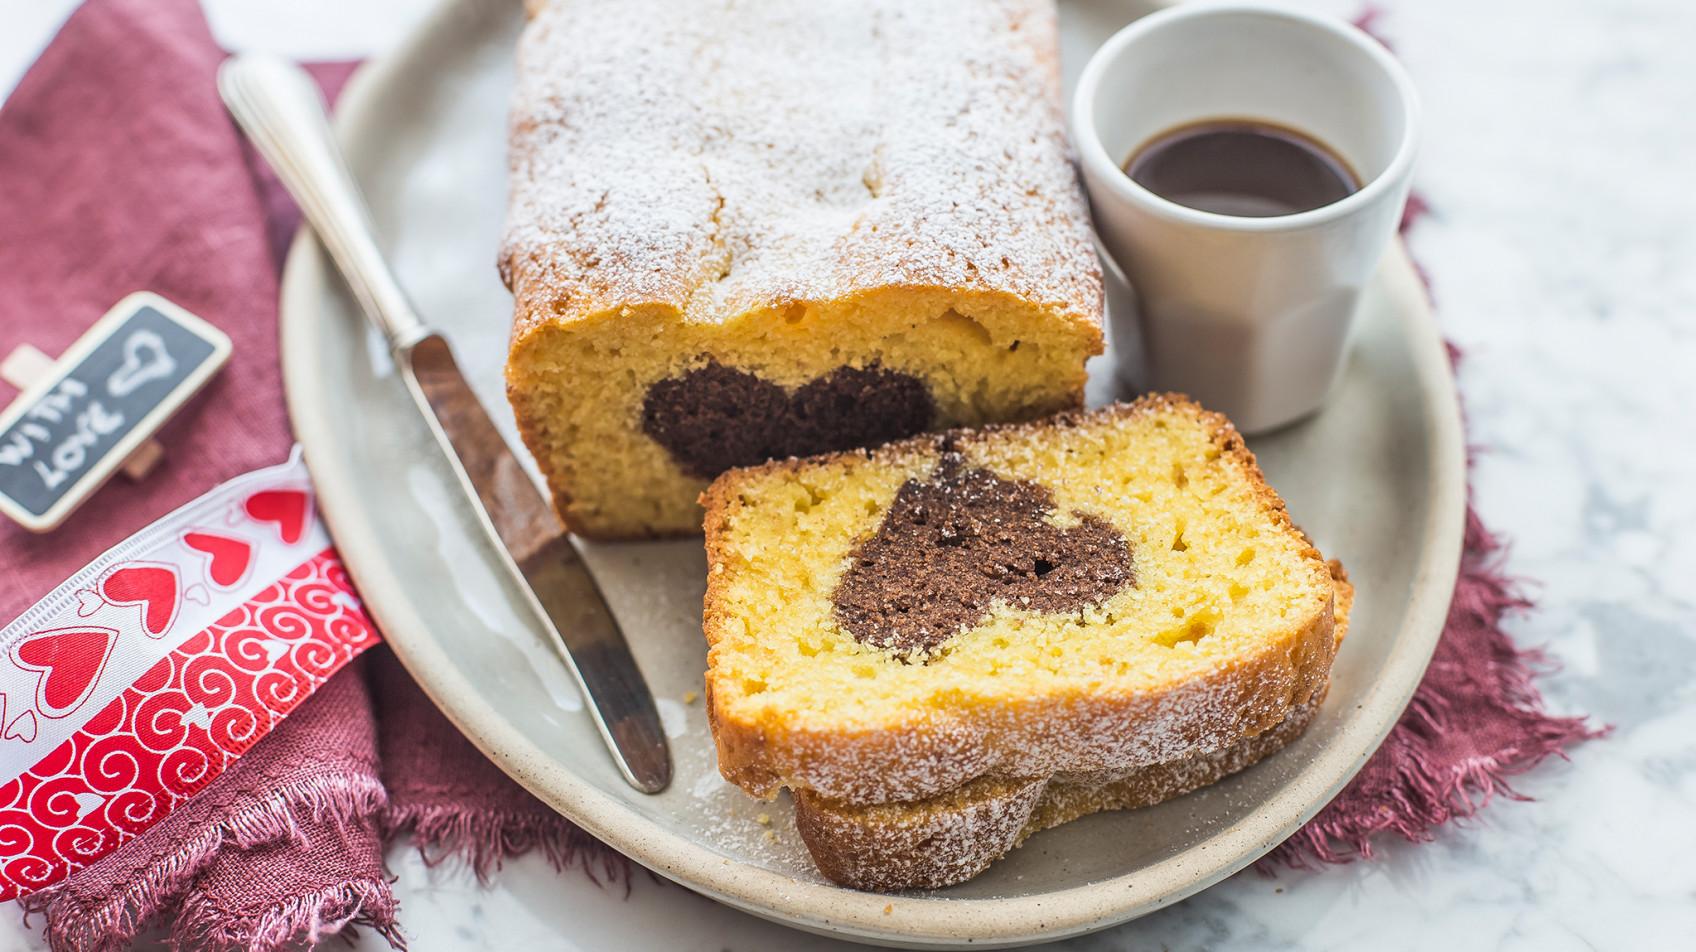 Plumcake senza glutine con sorpresa